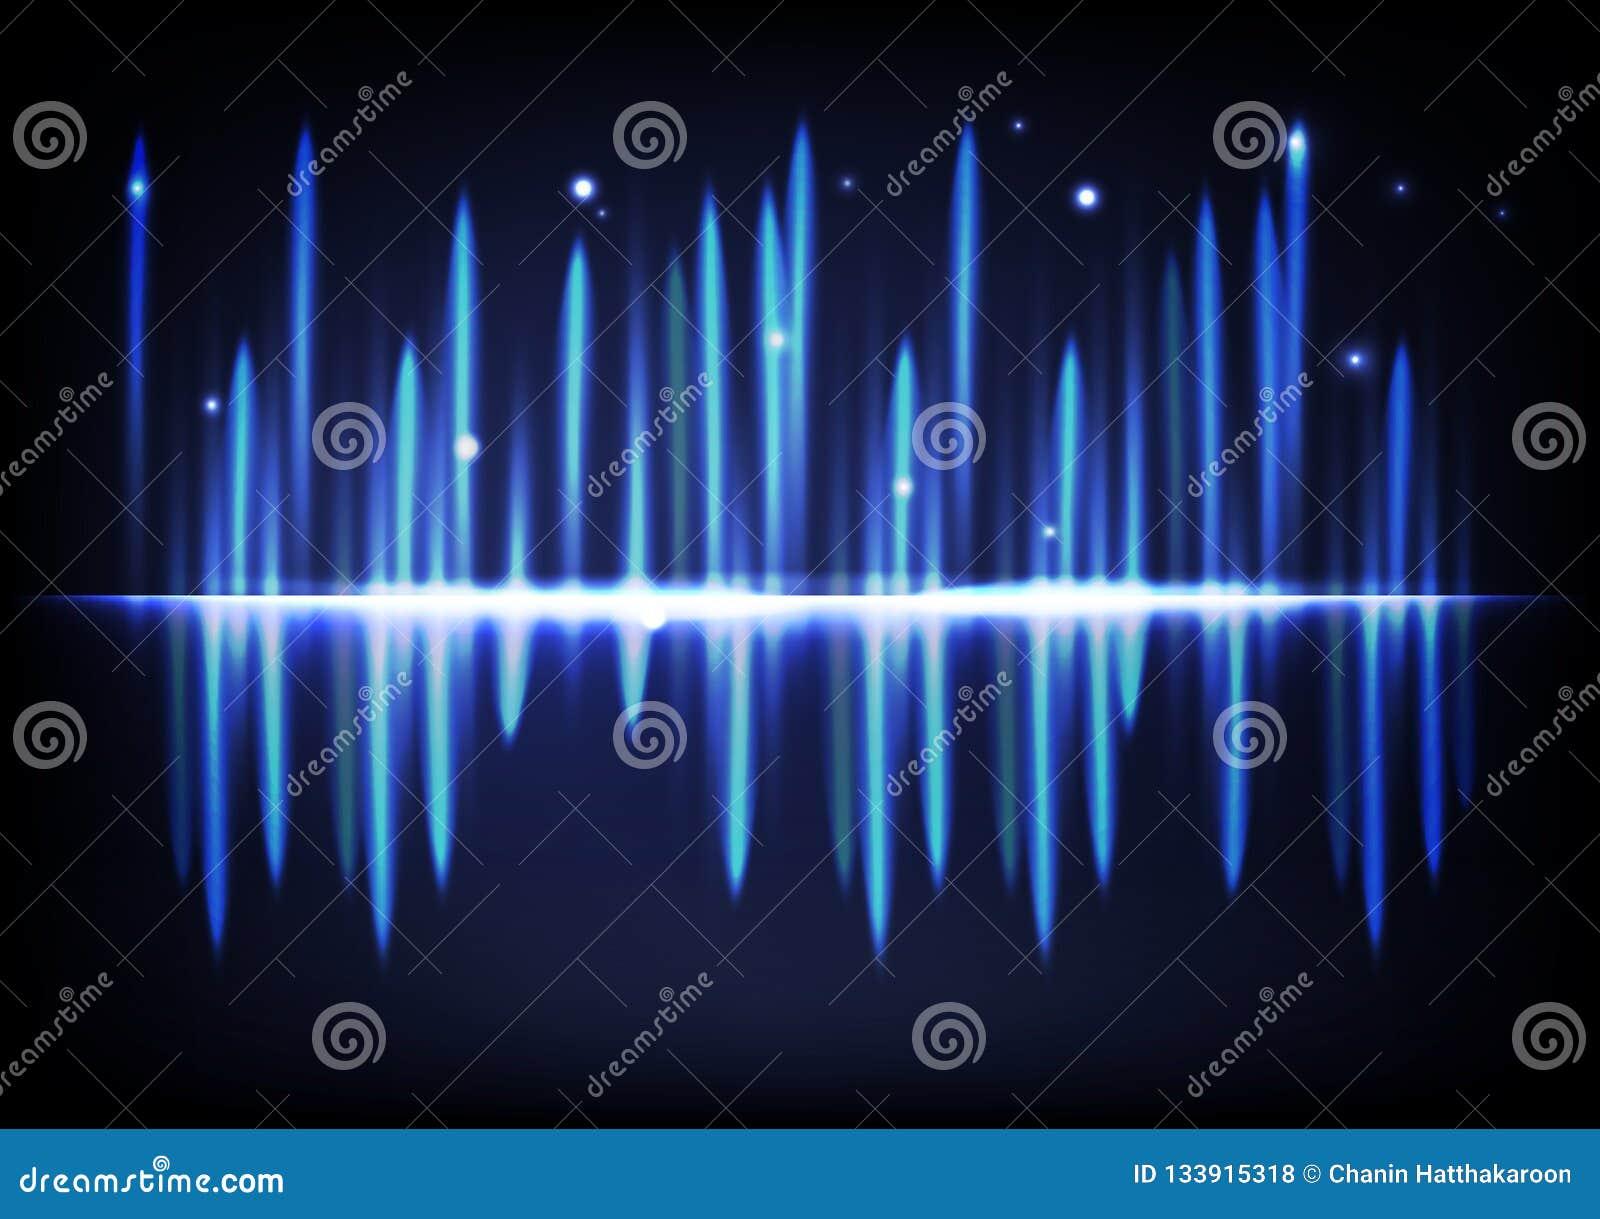 Equ abstrato de incandescência brilhante claro do volume da música de fundo do efeito